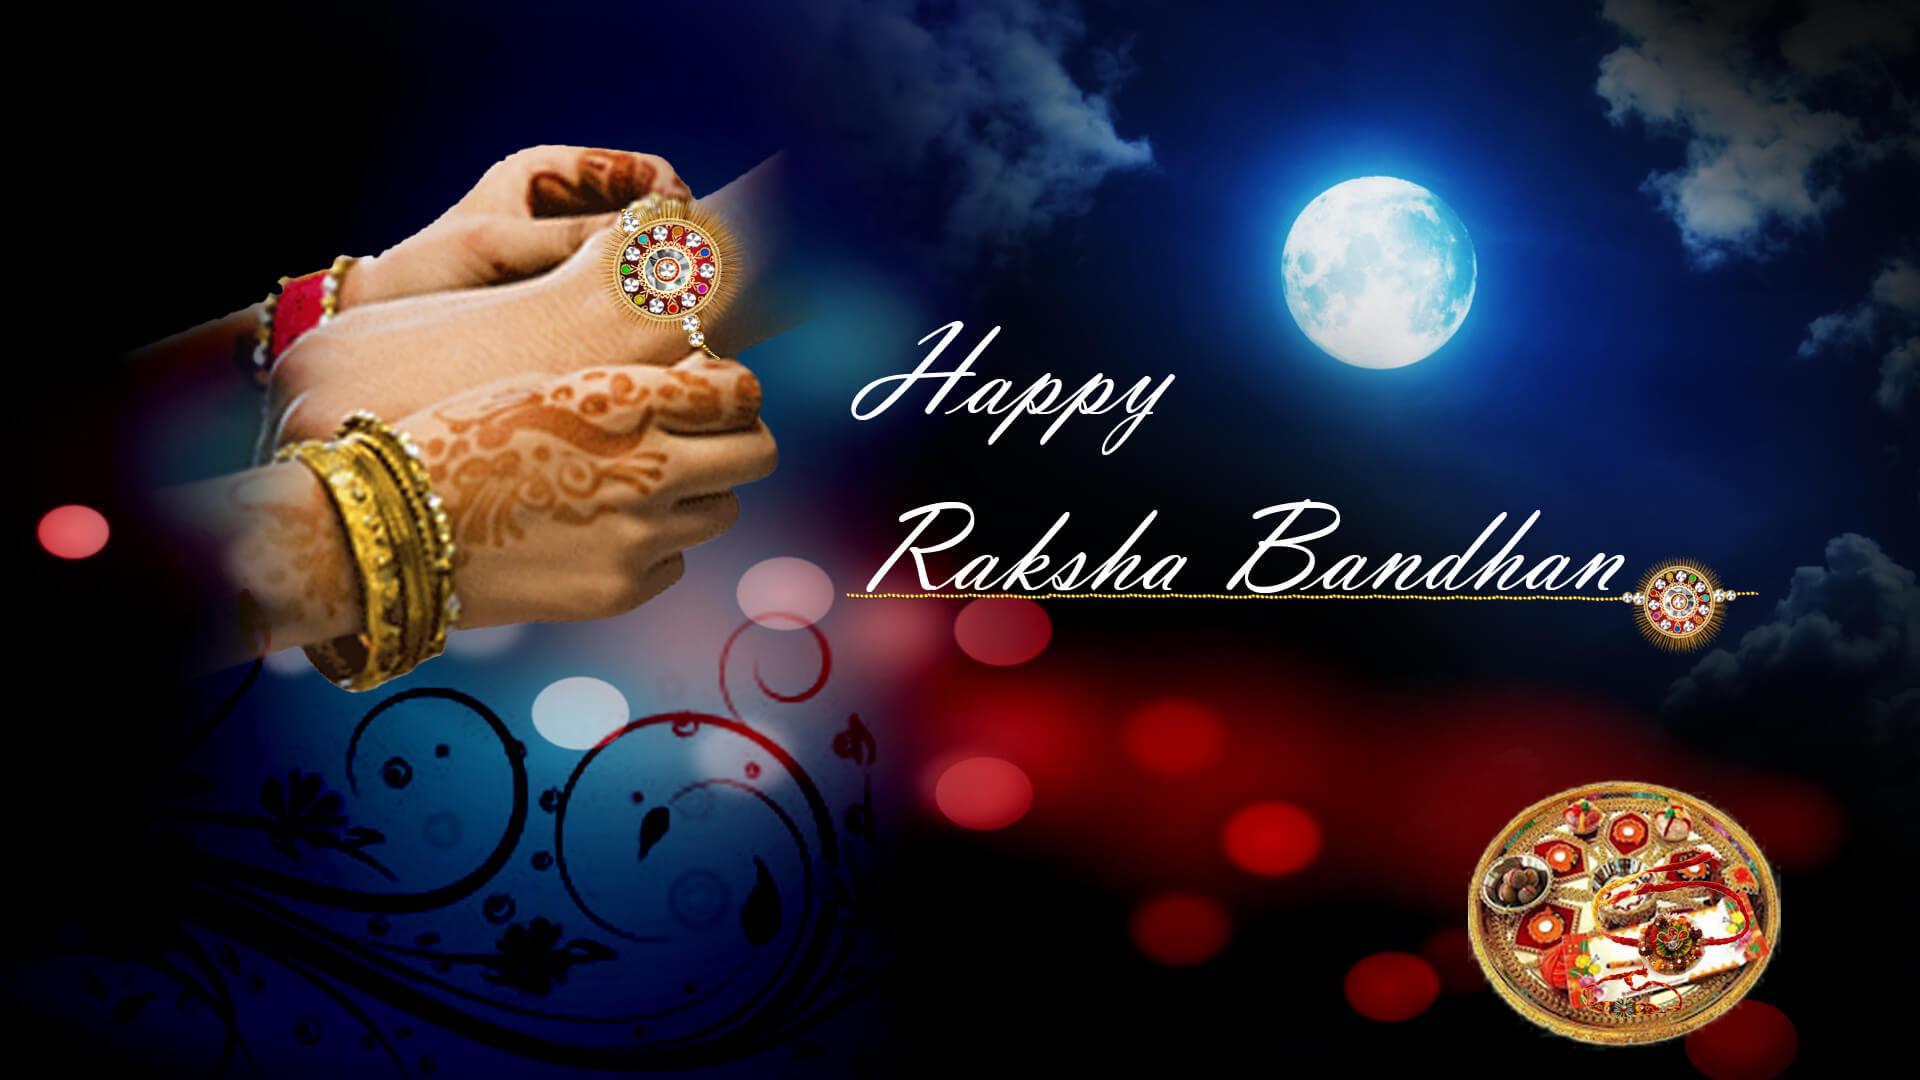 happy Raksha Bandhan images wallpapers brother sister